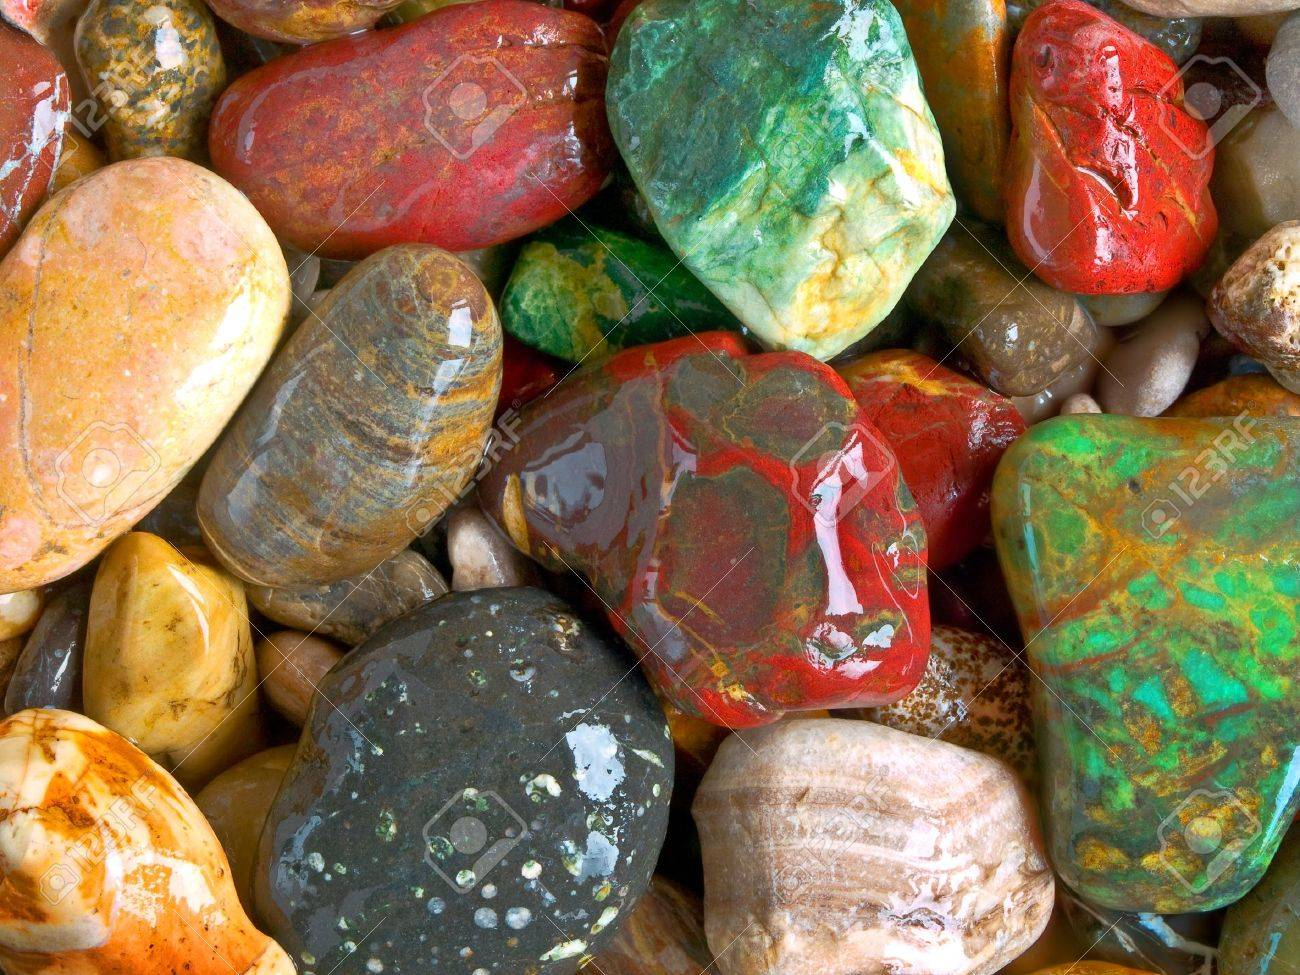 decorative pebbles closeup stock photo 8703359 - Decorative Stones